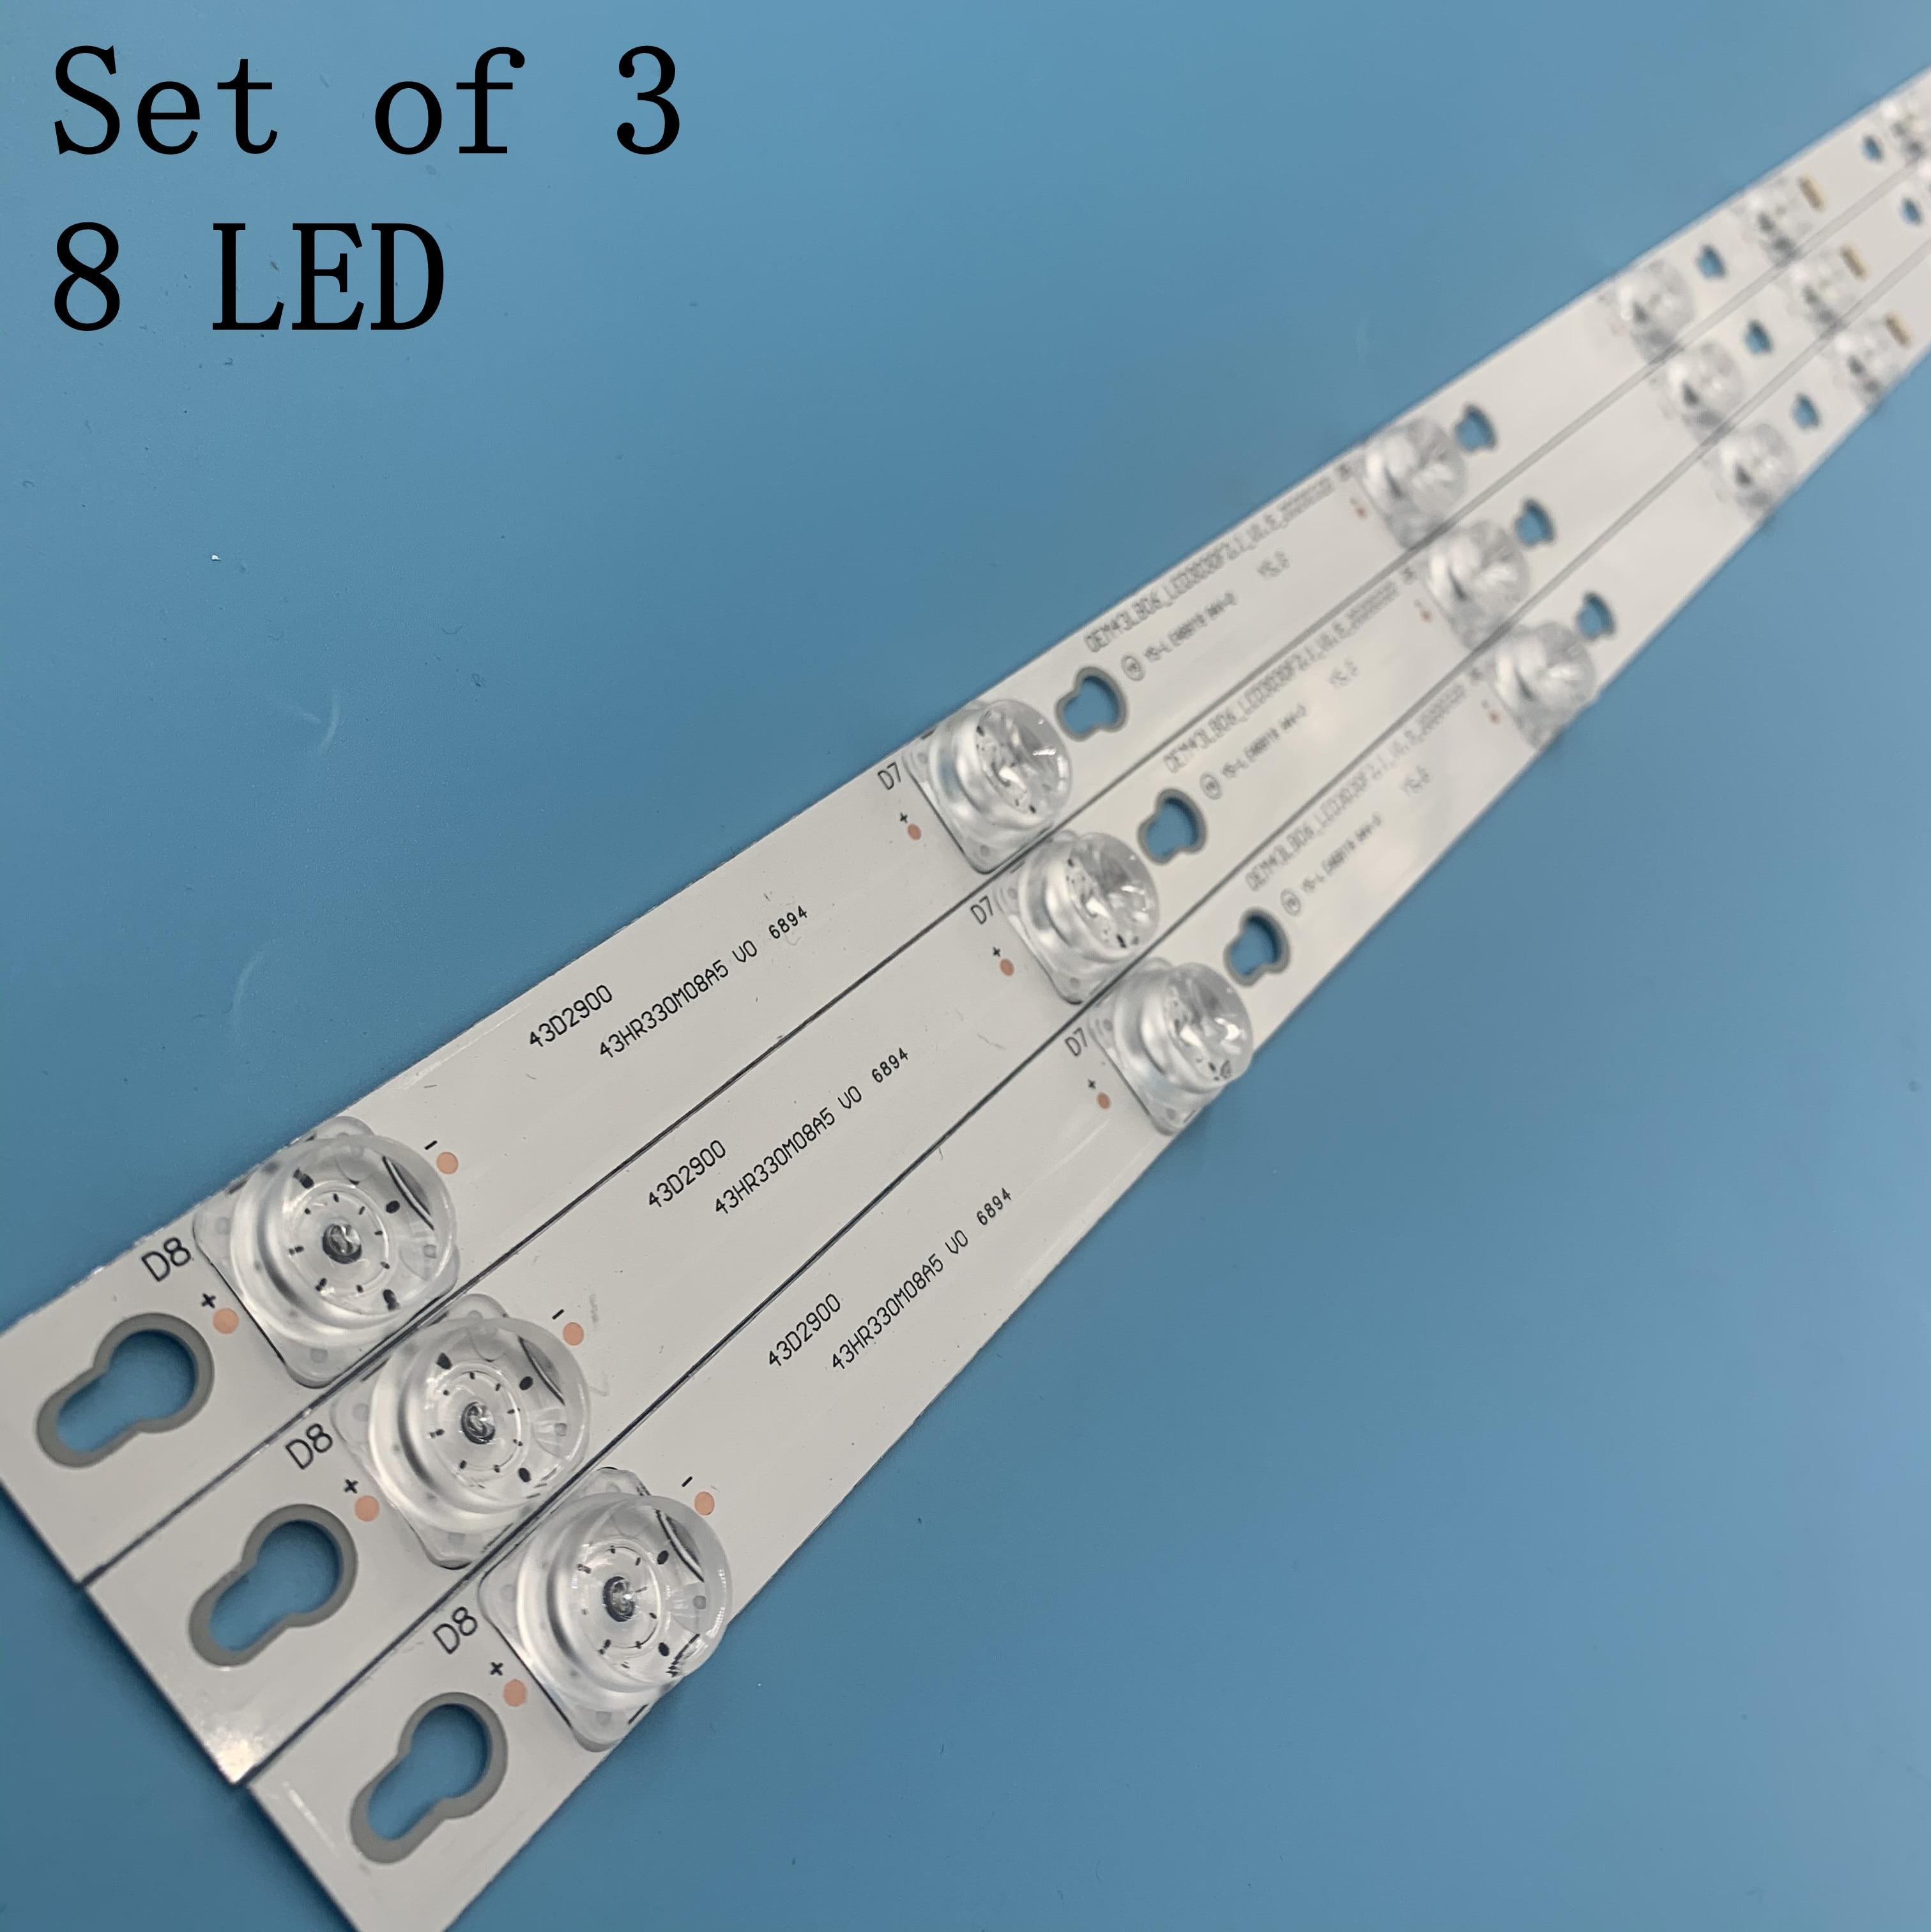 3pcs Backlight LED STRIP TOT_43D2900_3X8_3030C_d6t-2d1_4S1PX2 Rev.V2 TV TCL U43P6046